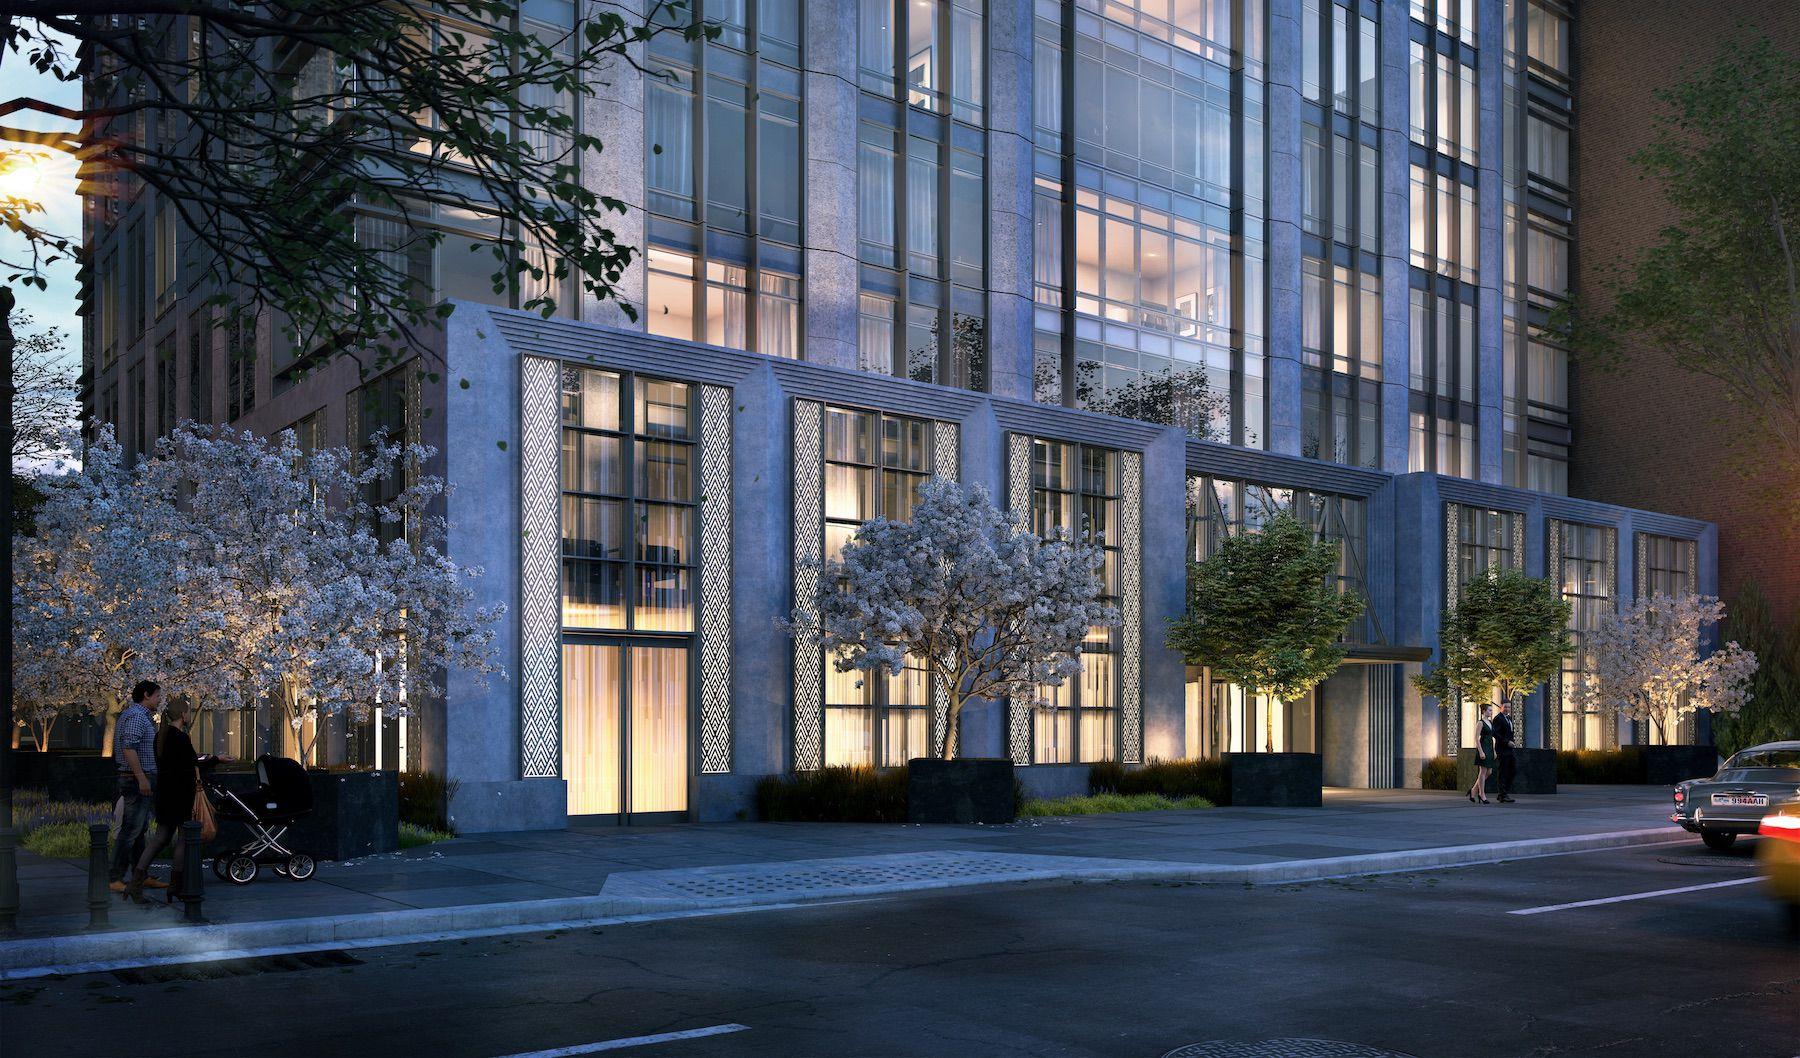 SJP Properties Reveals New Renderings Of The Elkus Manfredi-Designed Art Deco 200 Amsterdam Avenue On The Upper West Side